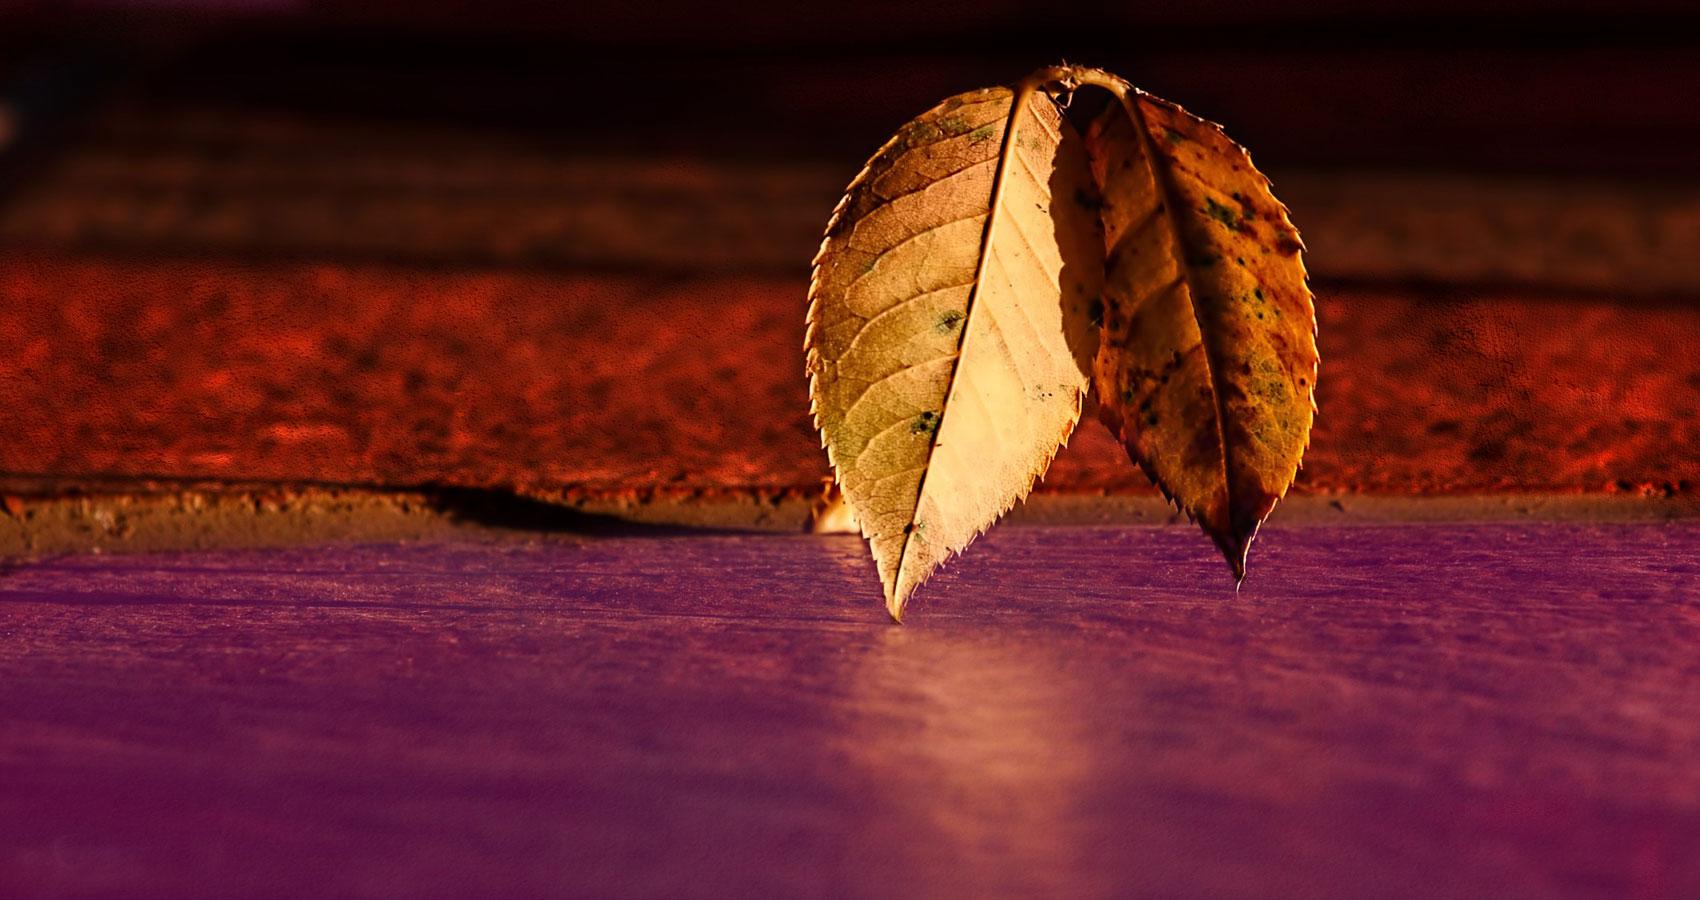 Woodwork, a poem written by Jenna Moquin at Spillwords.com